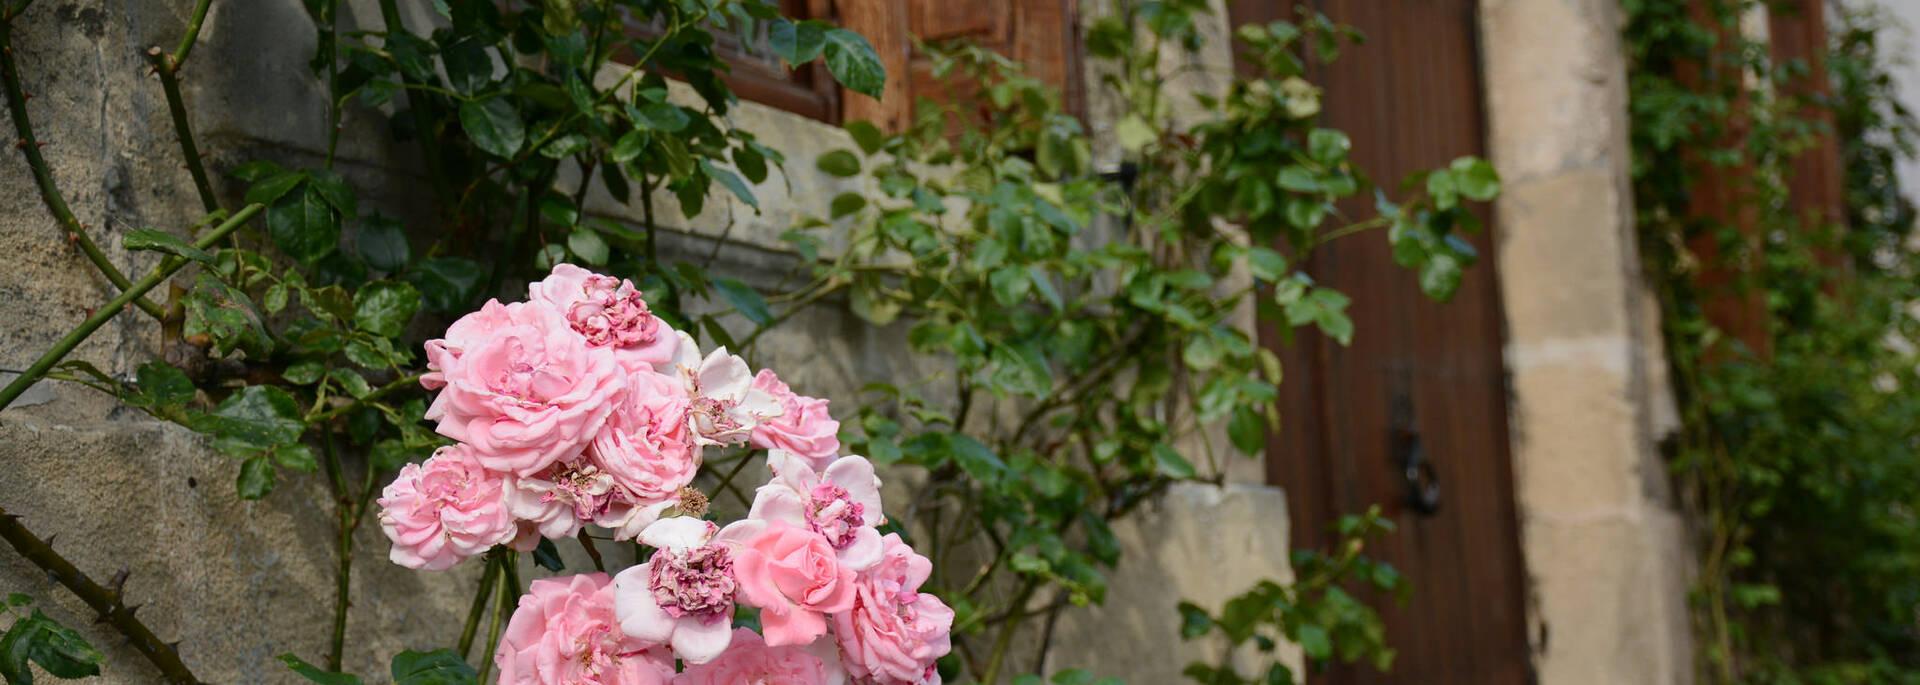 The medieval street flowery